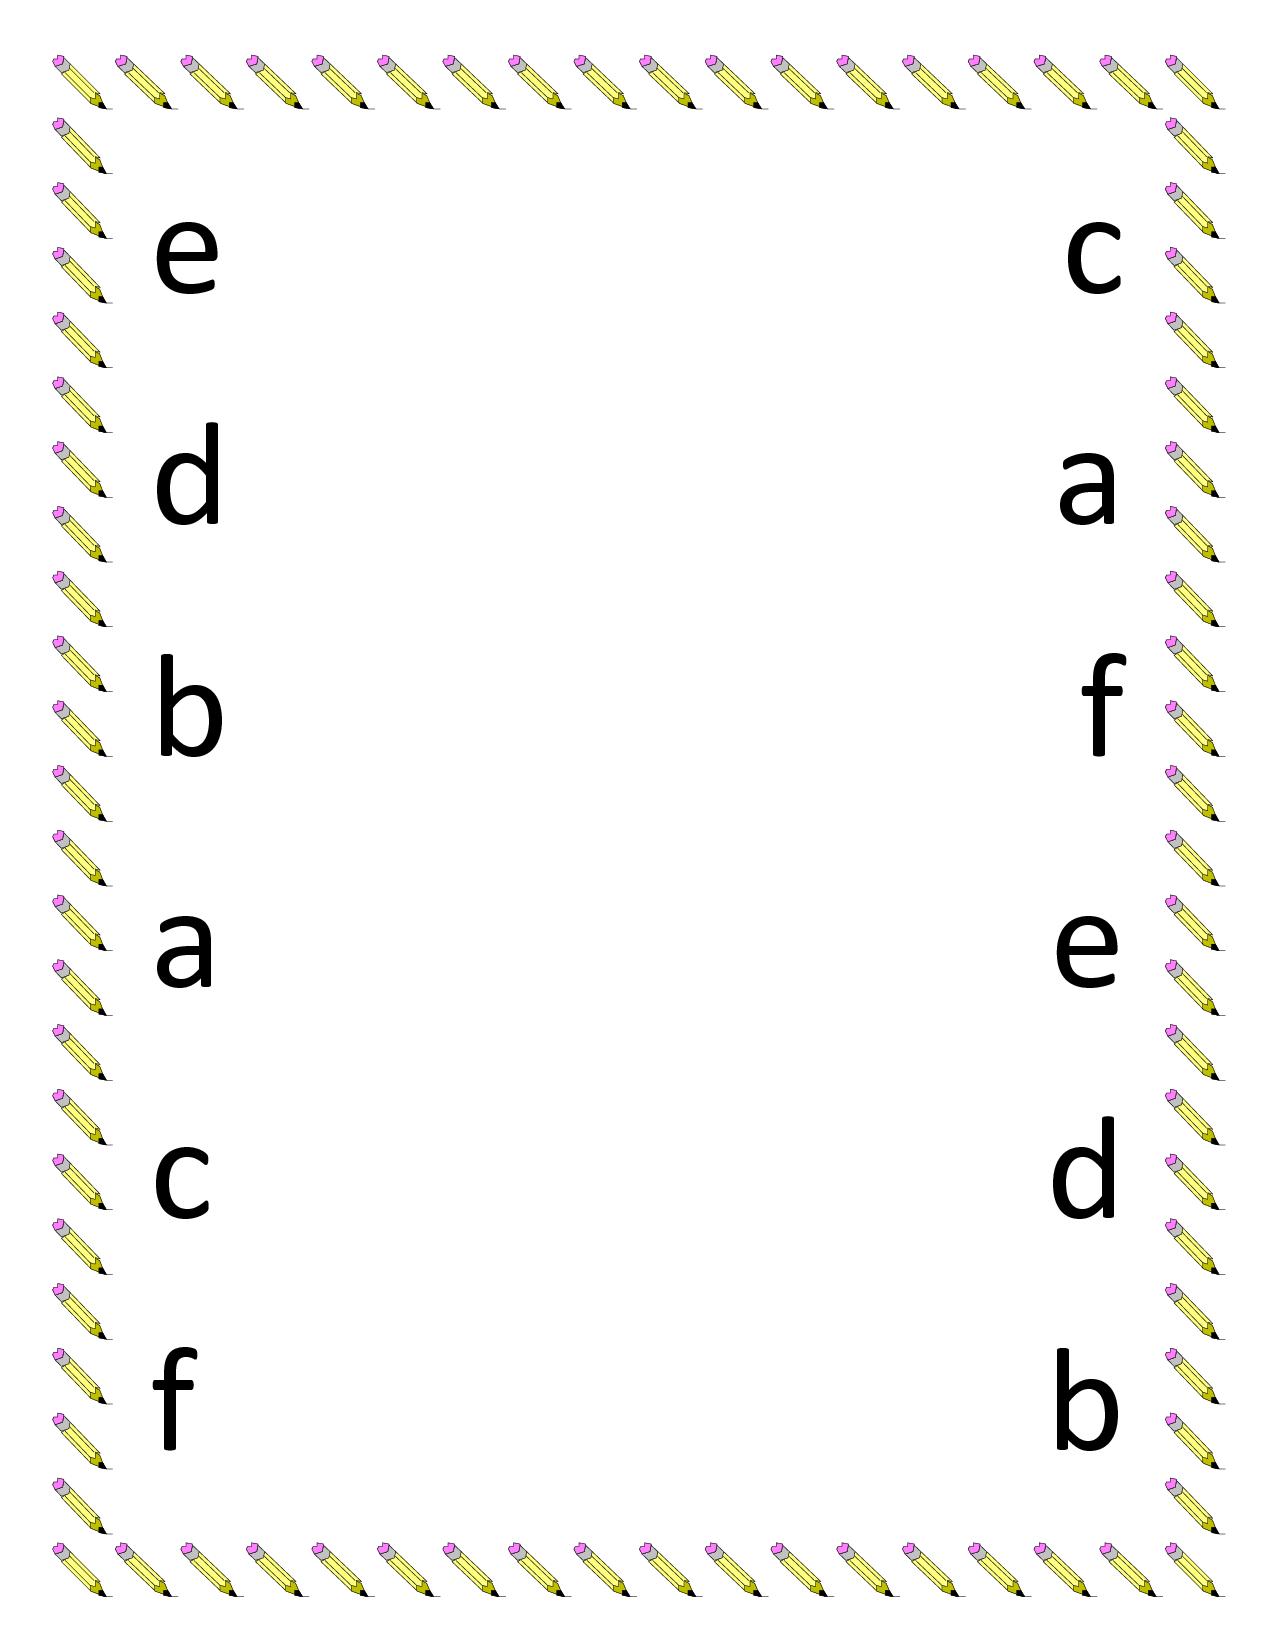 preschool science worksheets printables preschool matching worksheets lowercase letter. Black Bedroom Furniture Sets. Home Design Ideas